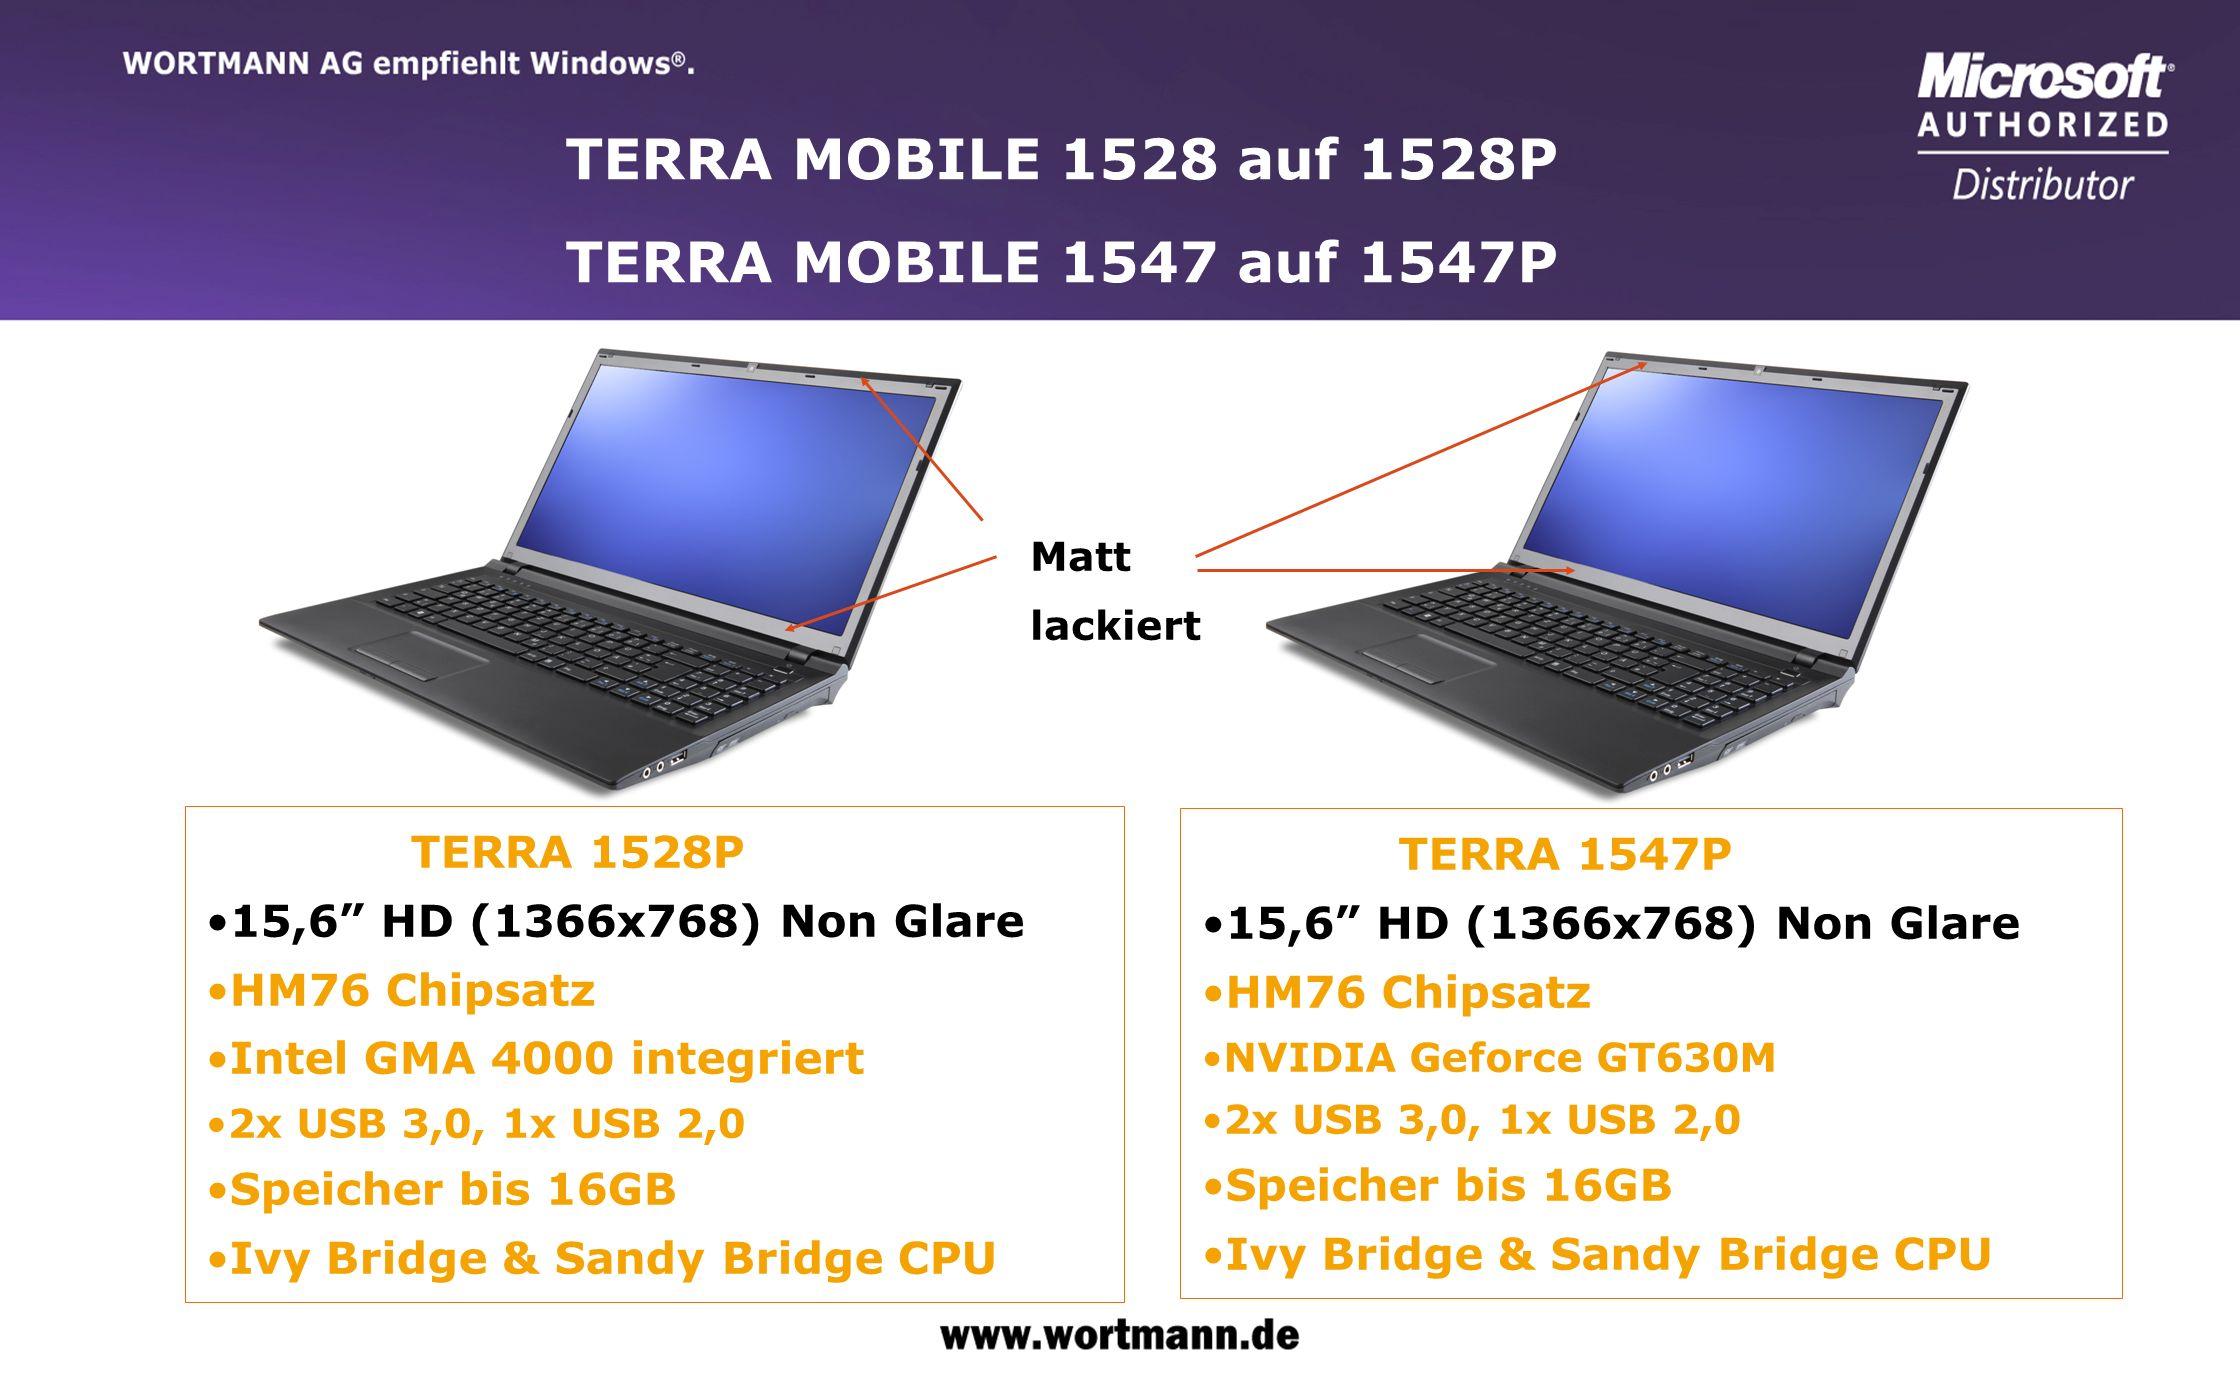 www.wortmann.de TERRA MOBILE 1528 auf 1528P TERRA MOBILE 1547 auf 1547P Matt lackiert TERRA 1528P 15,6 HD (1366x768) Non Glare HM76 Chipsatz Intel GMA